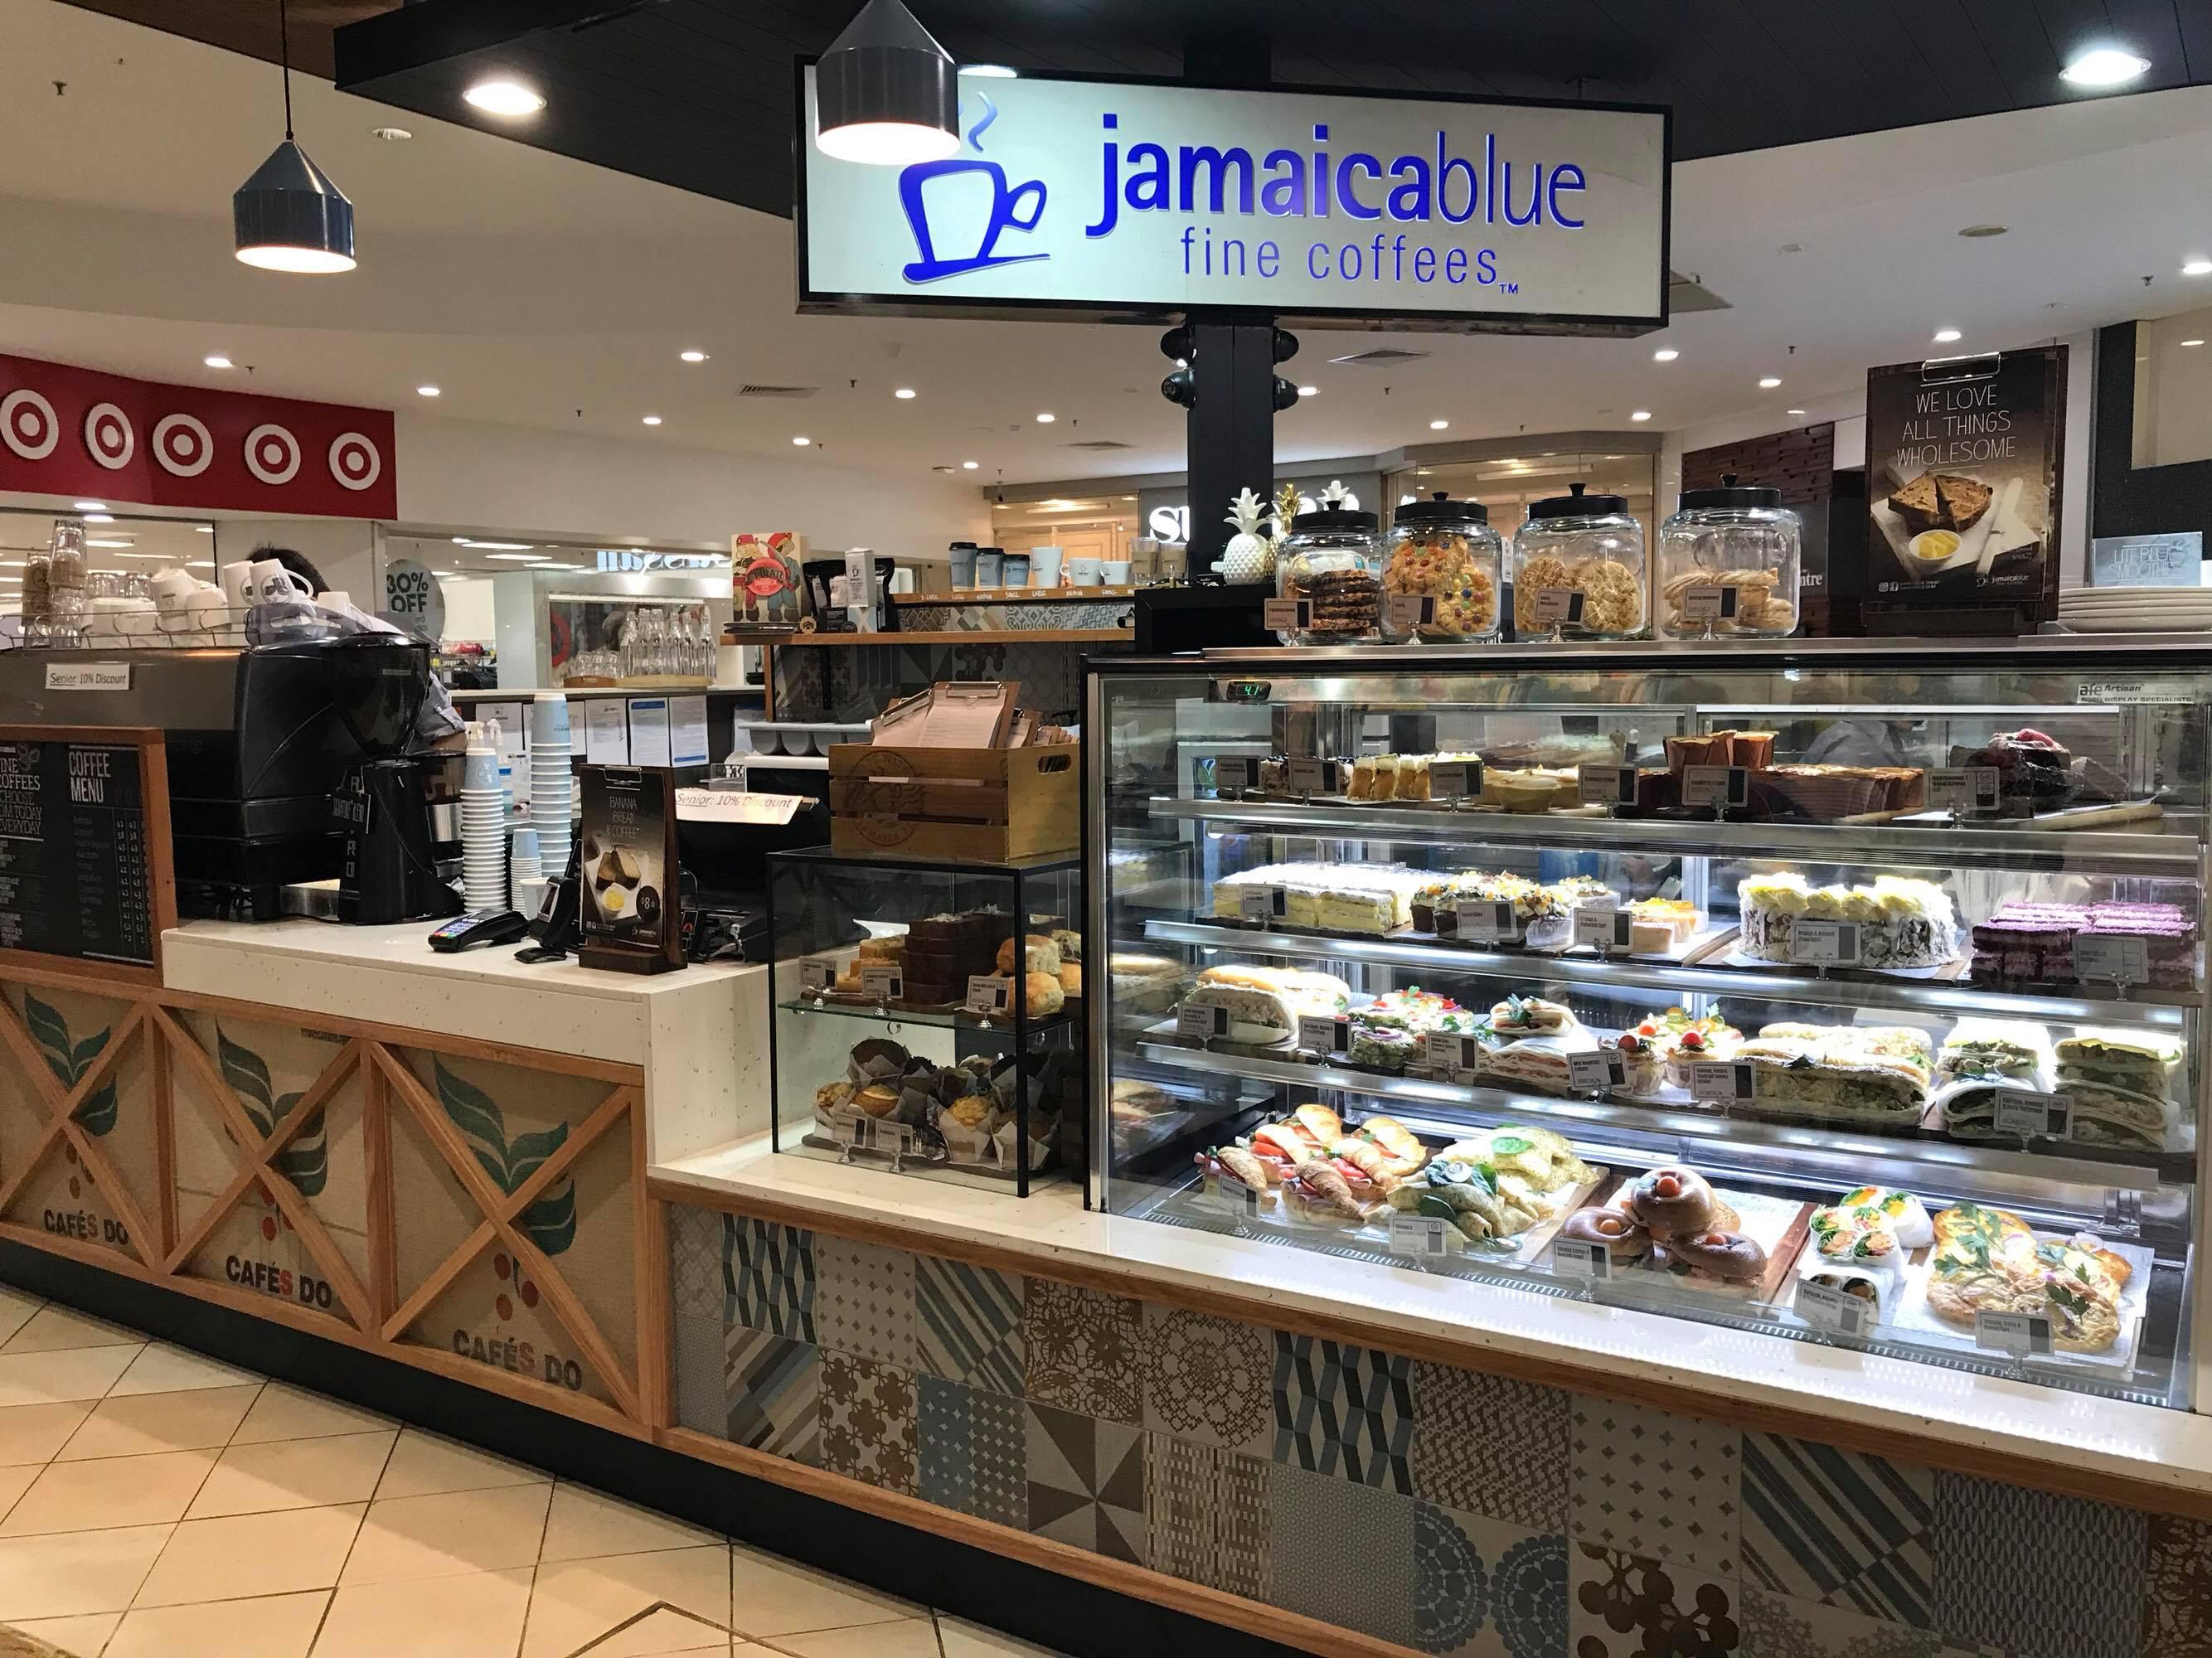 Jamaica Blue Cafe/Restaurant, Profitable & easy to run